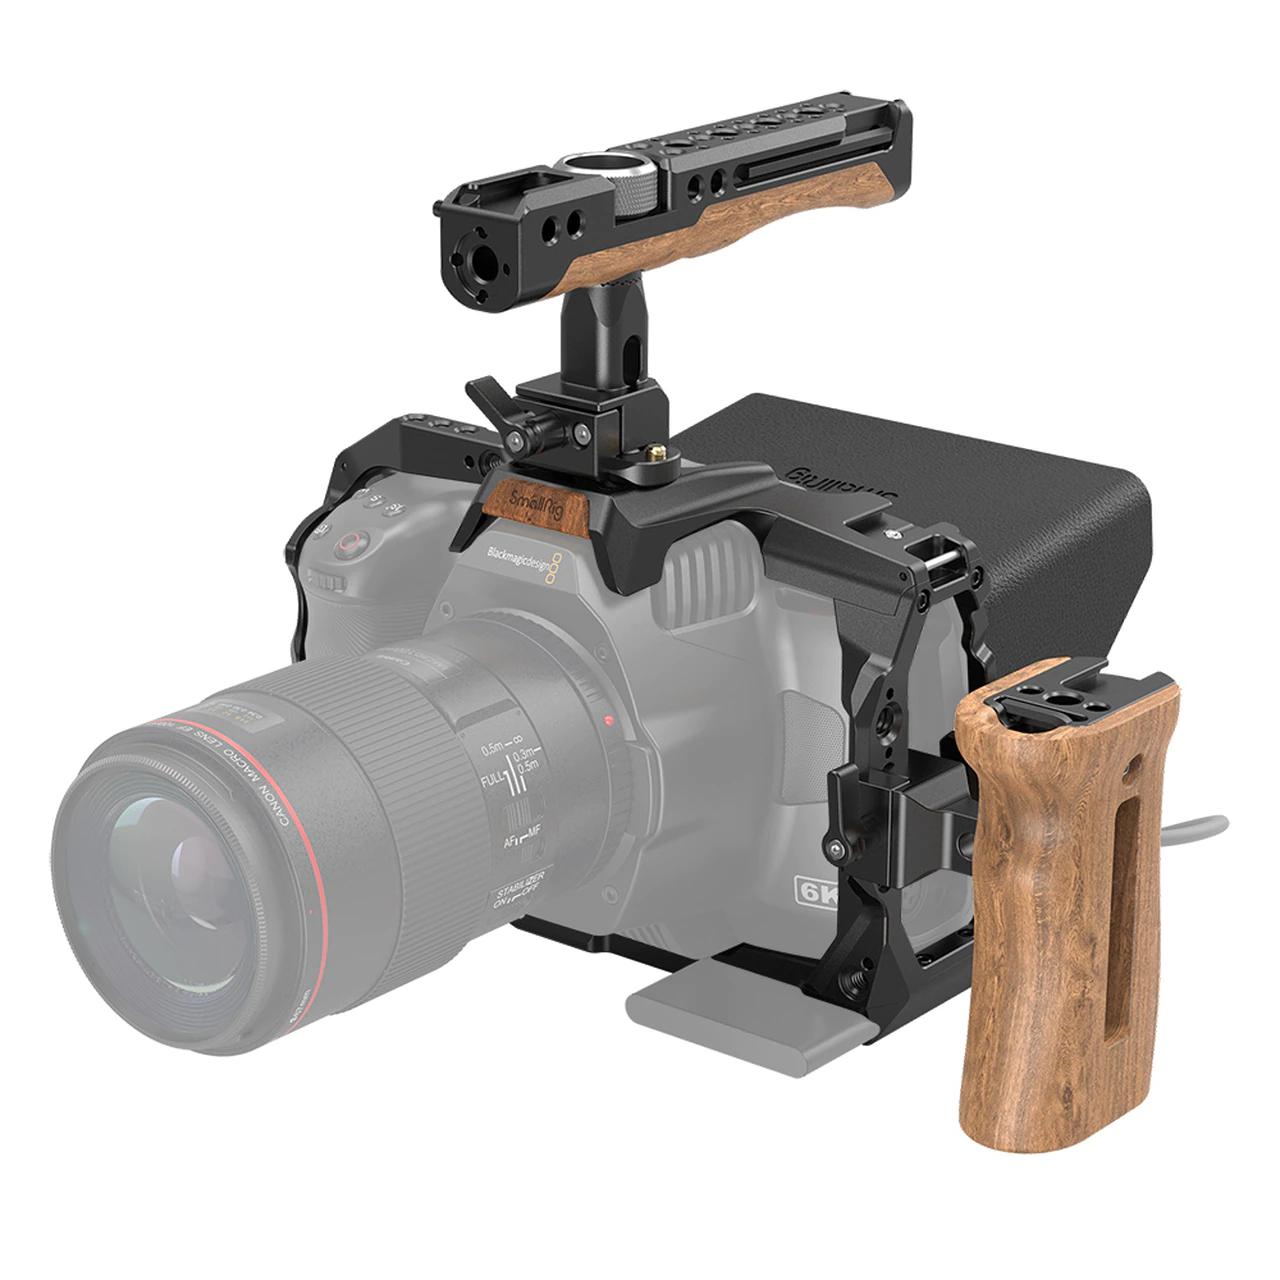 smallrig-3299-professional-accessory-kit-zestaw-akcesori%C3%B3w-bmpcc-pocket-6k-pro-02%281%29.jpg